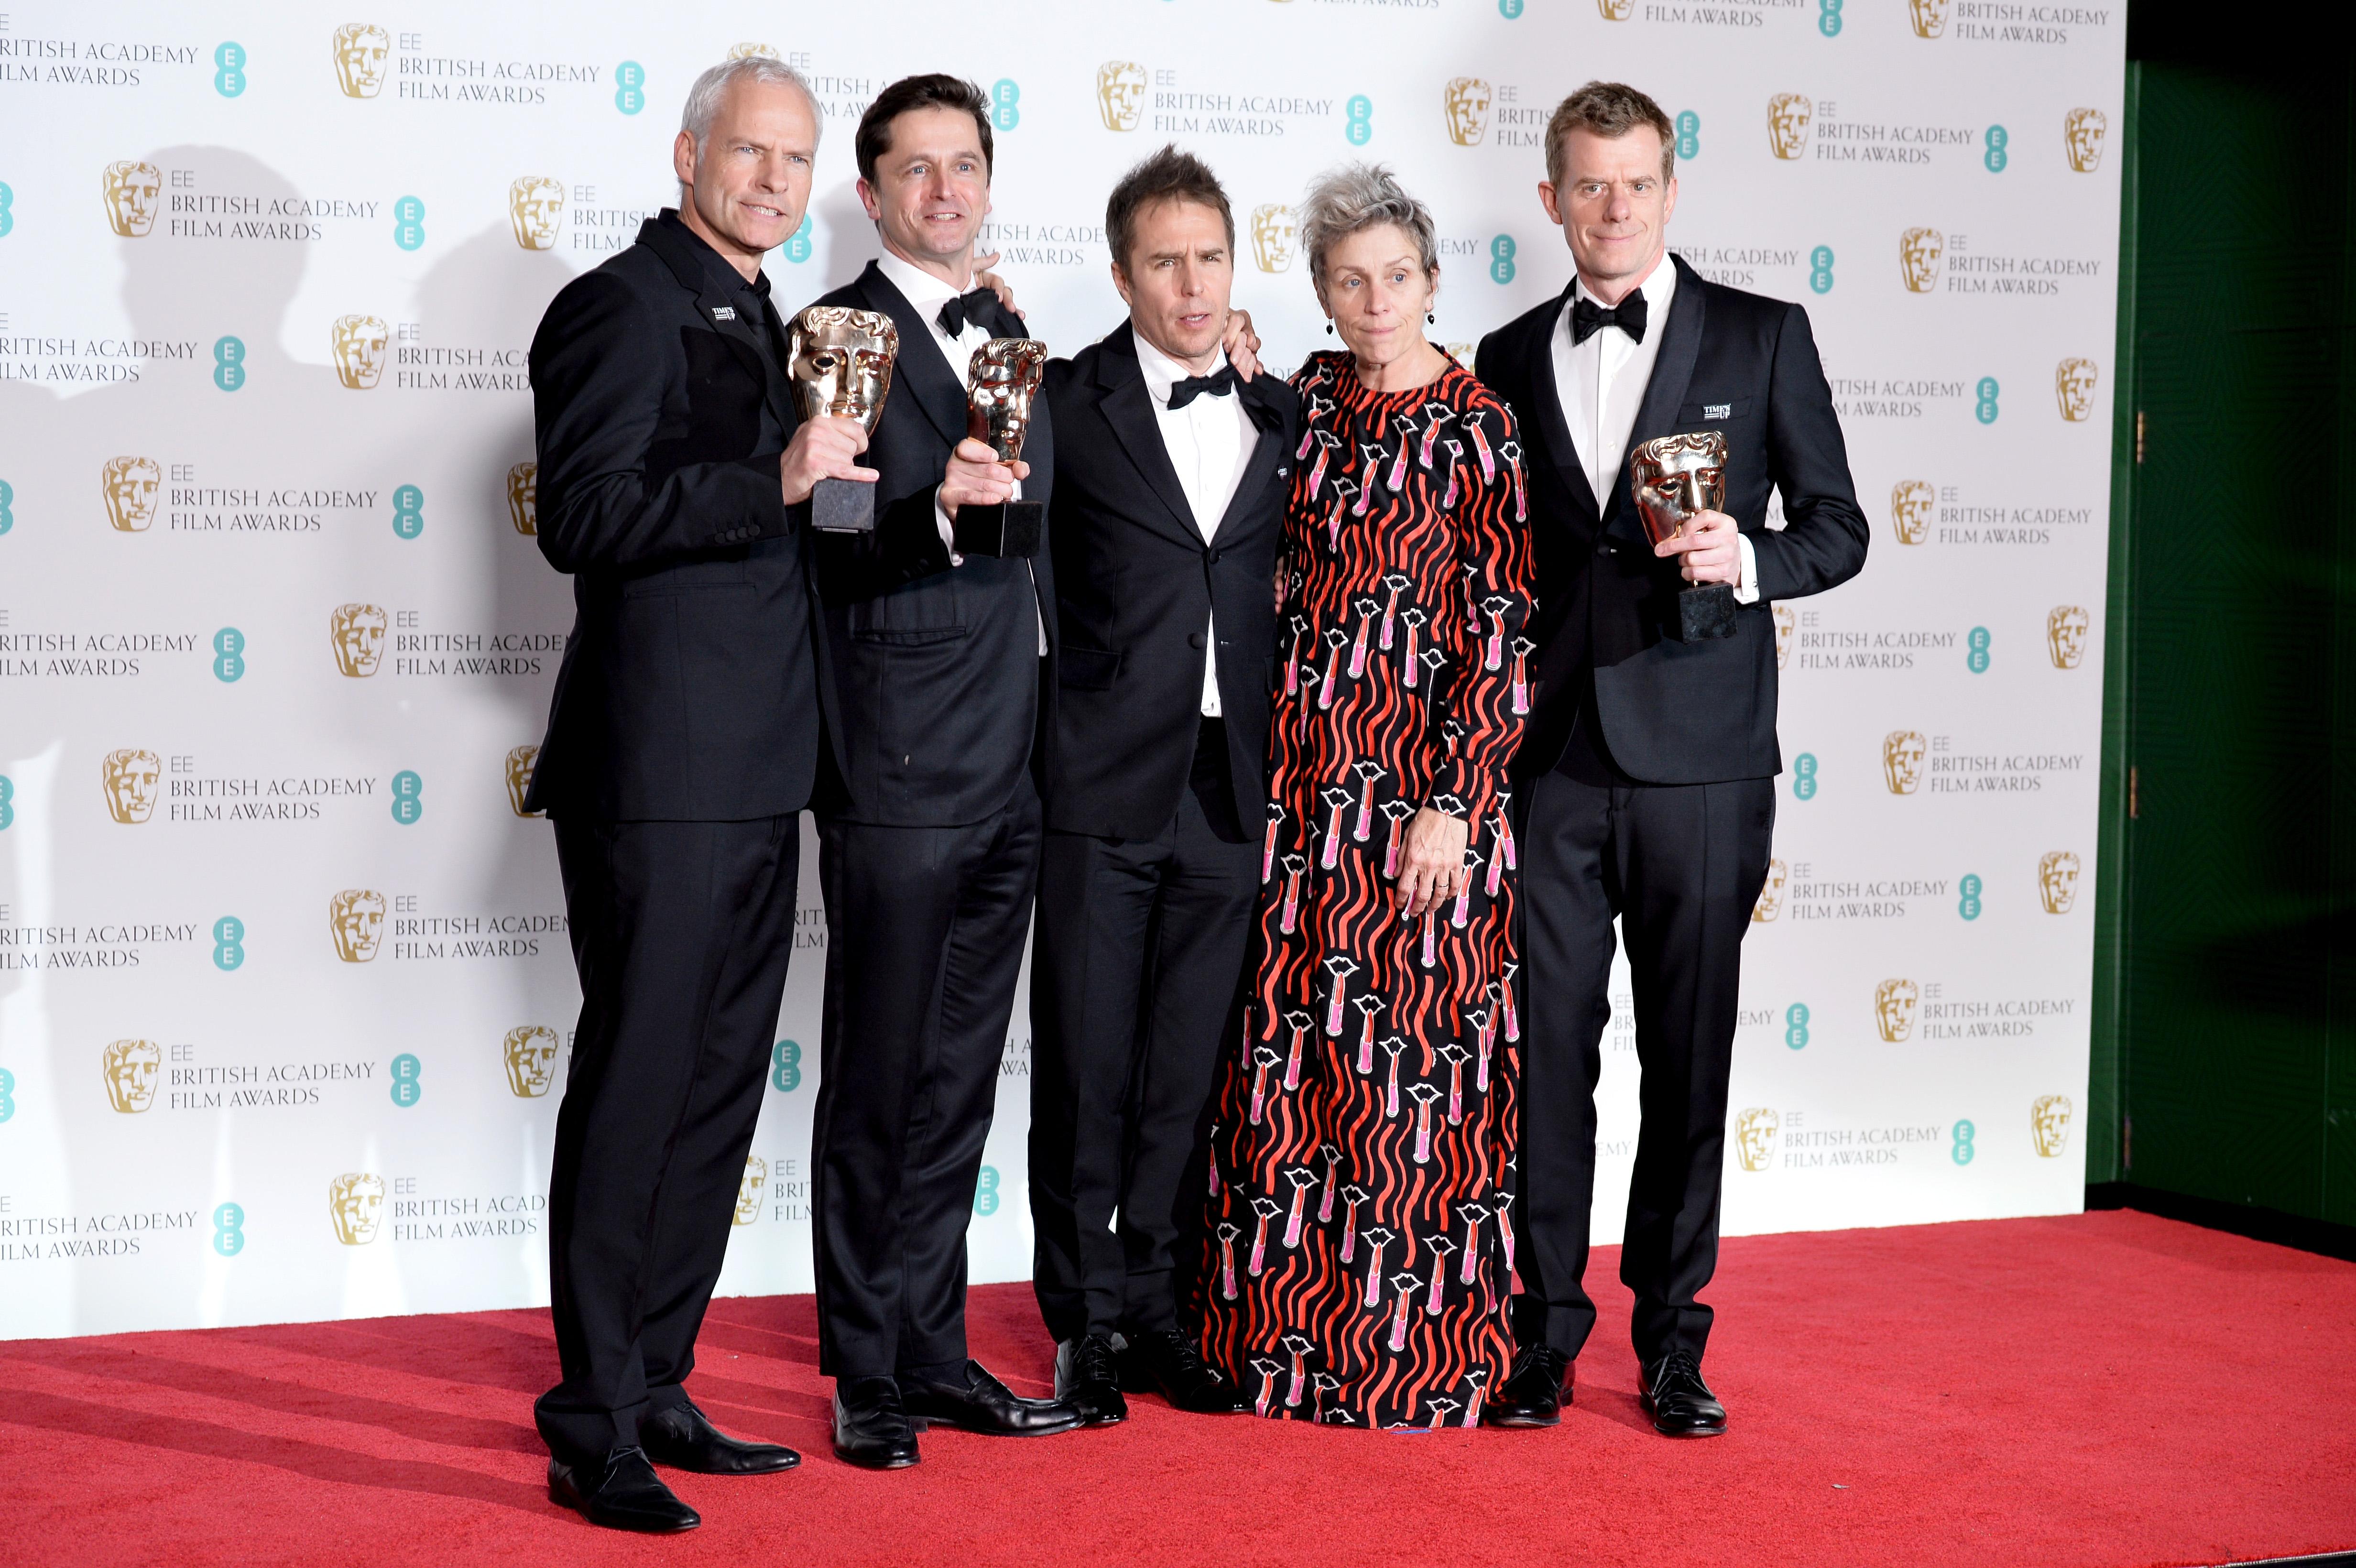 Frances-McDormand-Wins-Best-Actress-Award-At-The-2018-BAFTAs